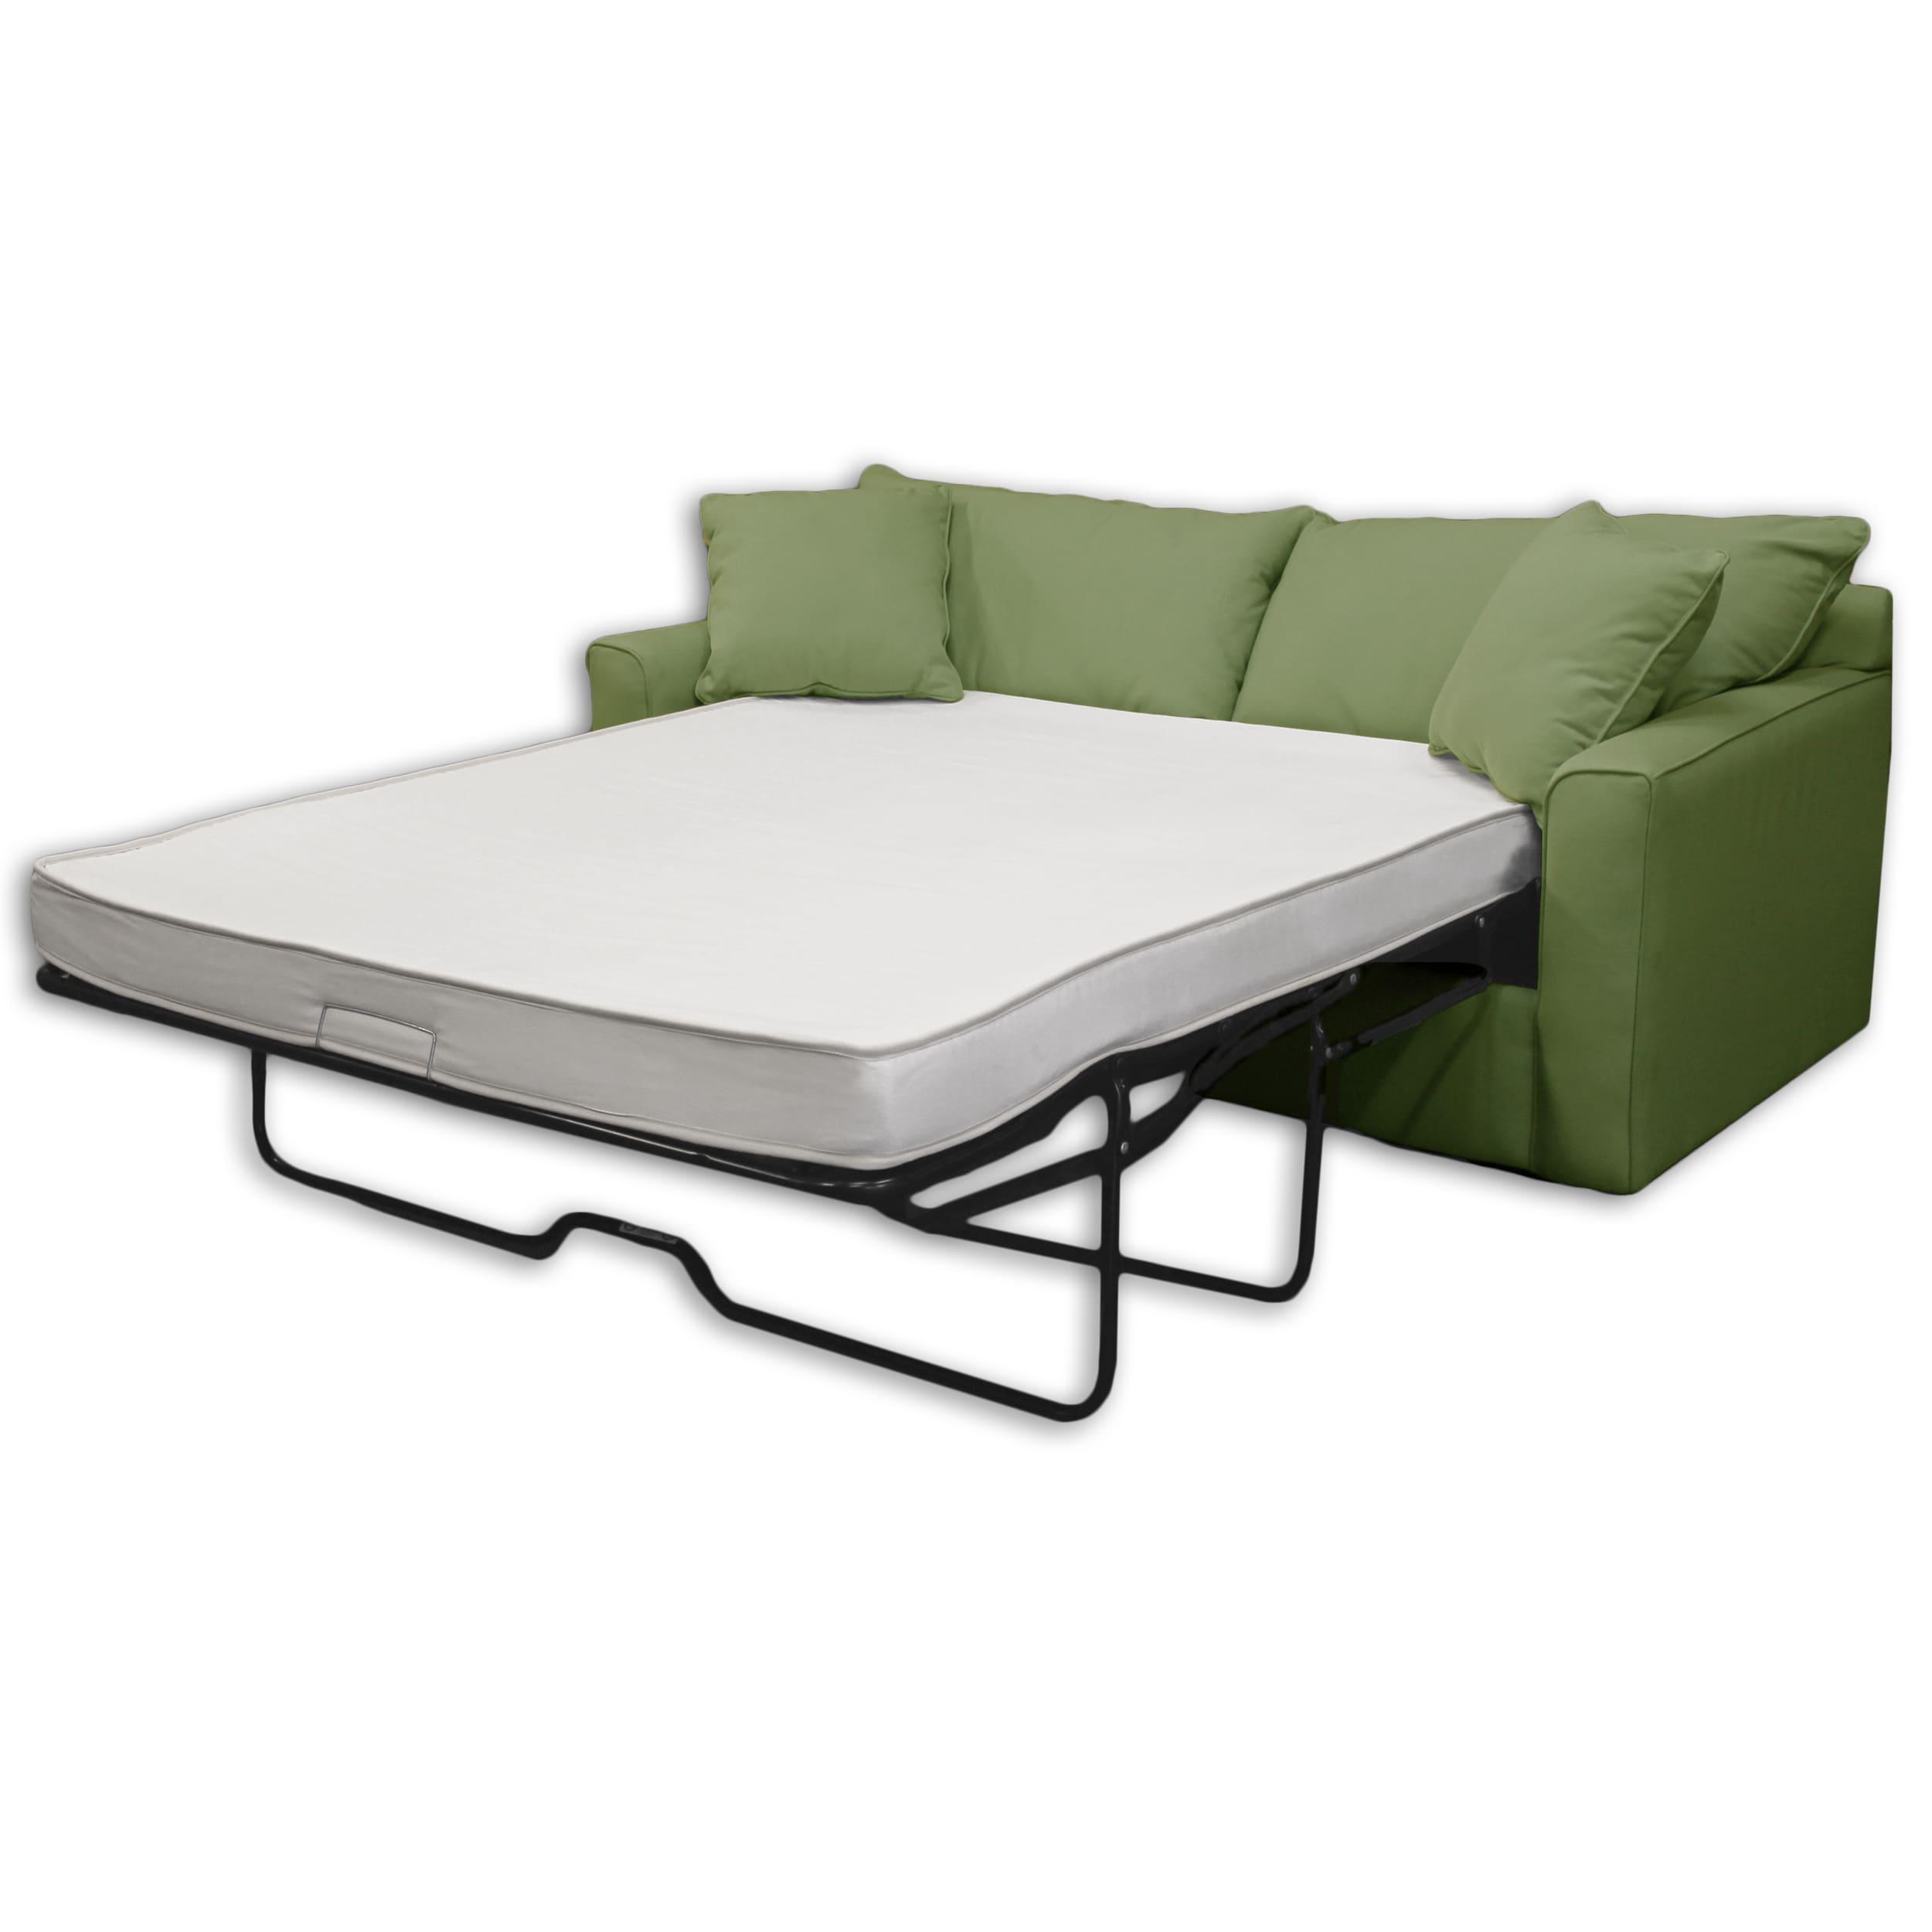 Select Luxury Reversible 4 inch Twin size Foam Sofa Bed